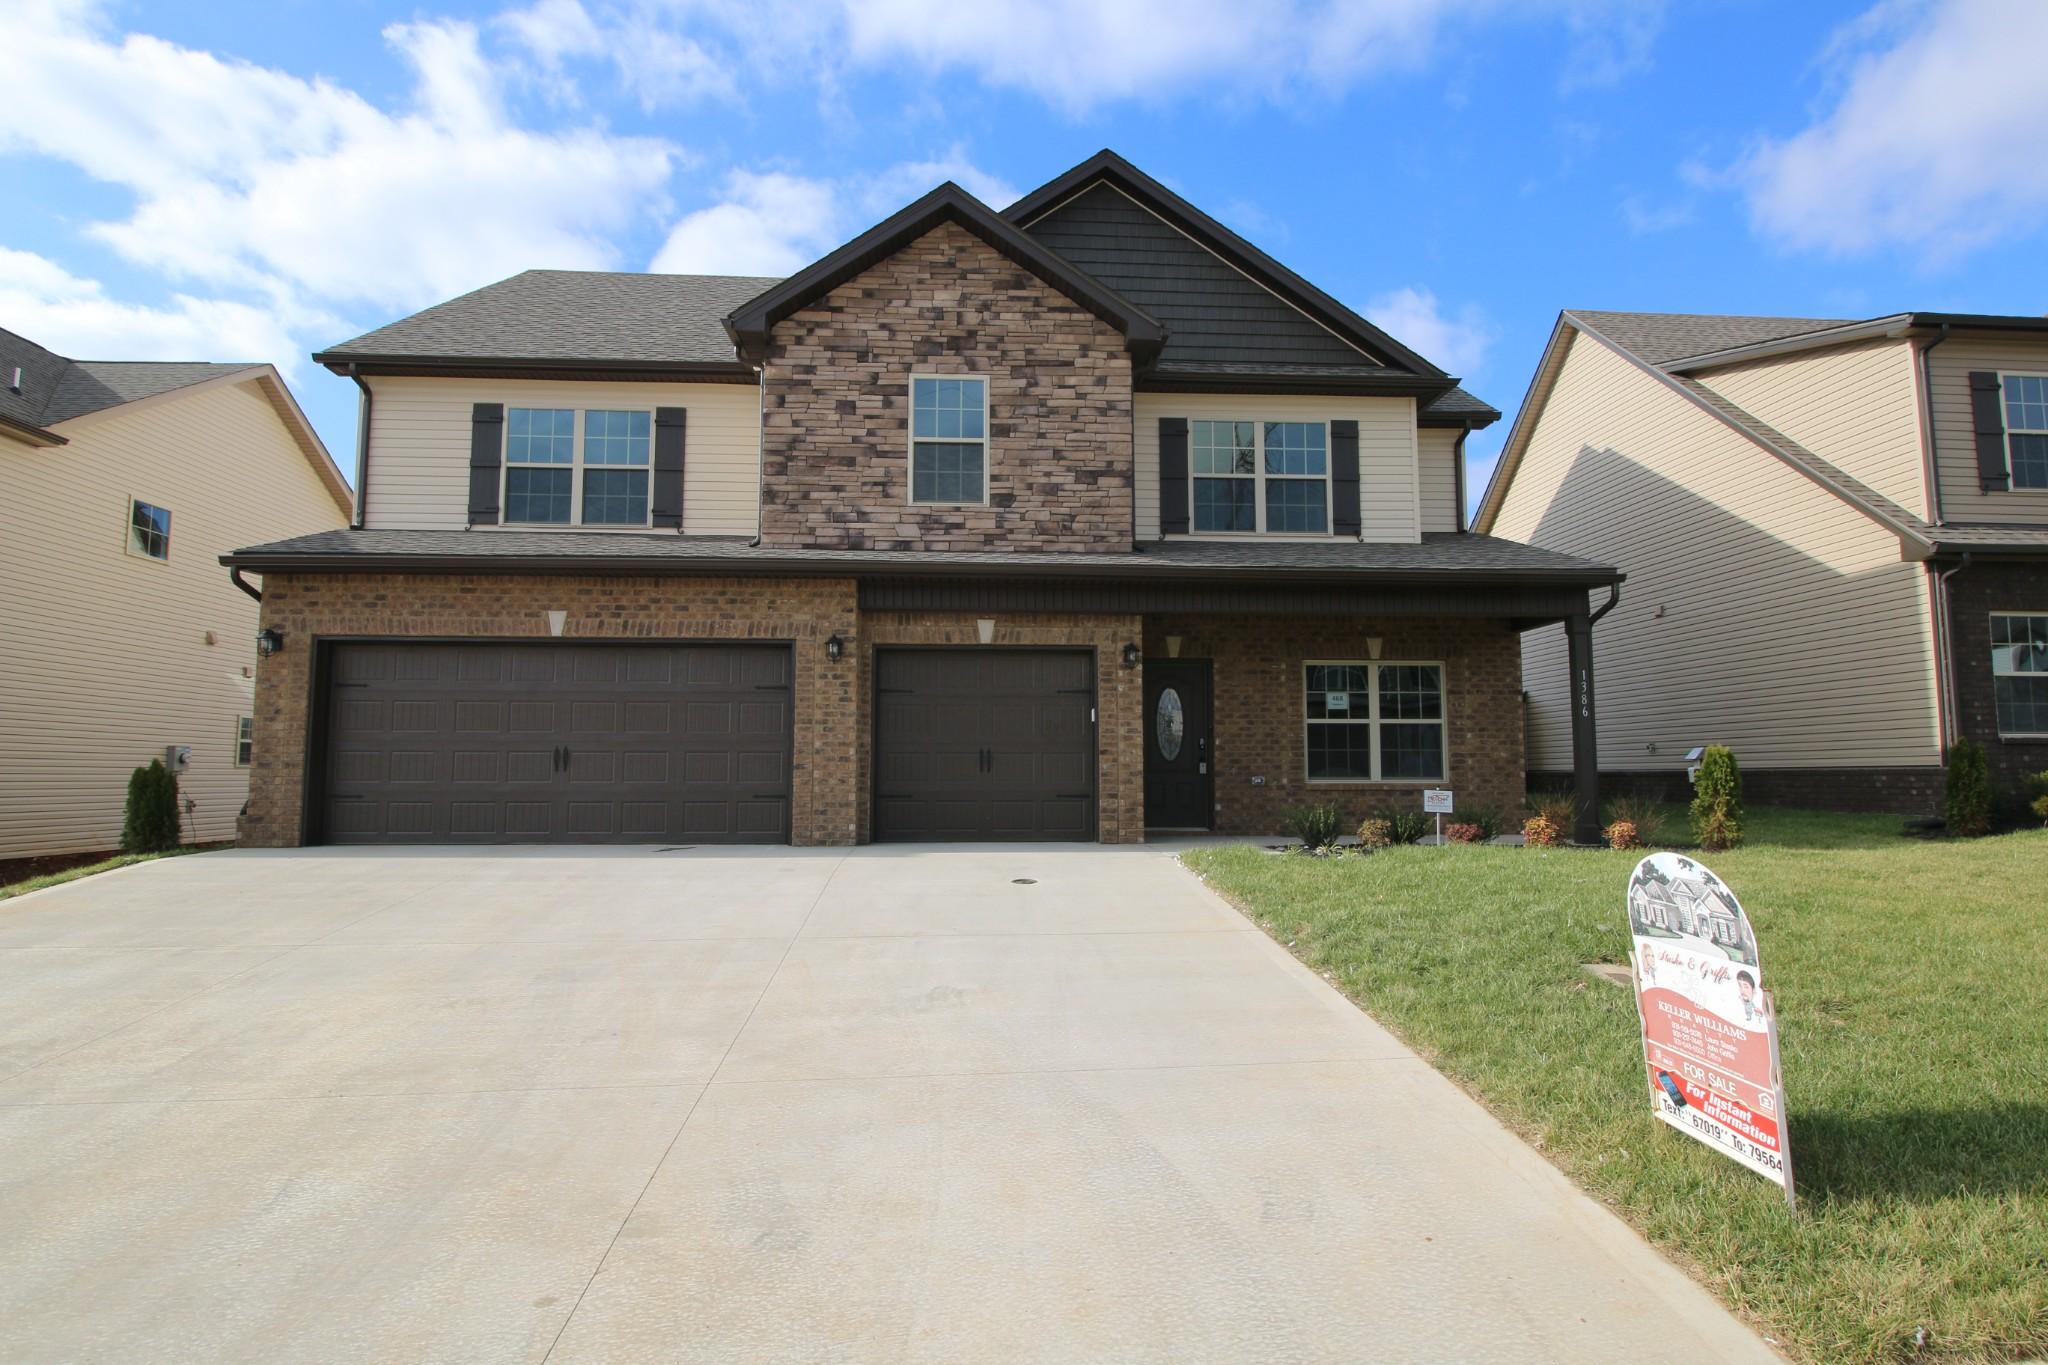 468 Summerfield, Clarksville, TN 37040 - Clarksville, TN real estate listing